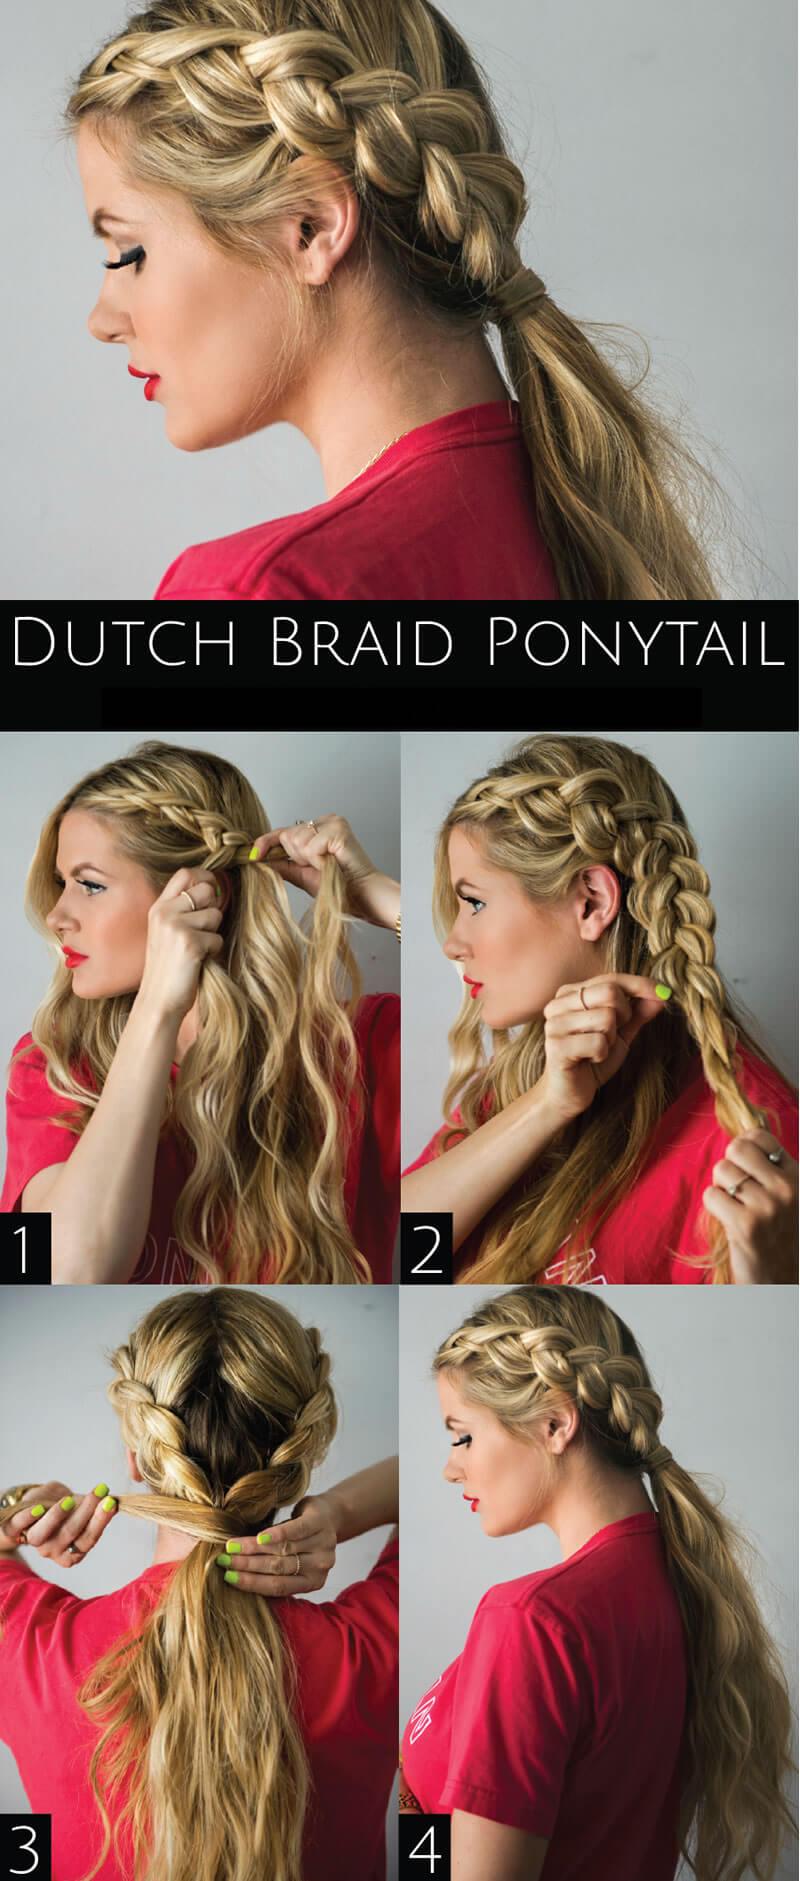 penteado-tranca-braid-amber-moderno-cabelo-loiro-blond-hair-tranca-embutida-escama-de-peixe-ella-diniz-nina-cares-marina-moreira